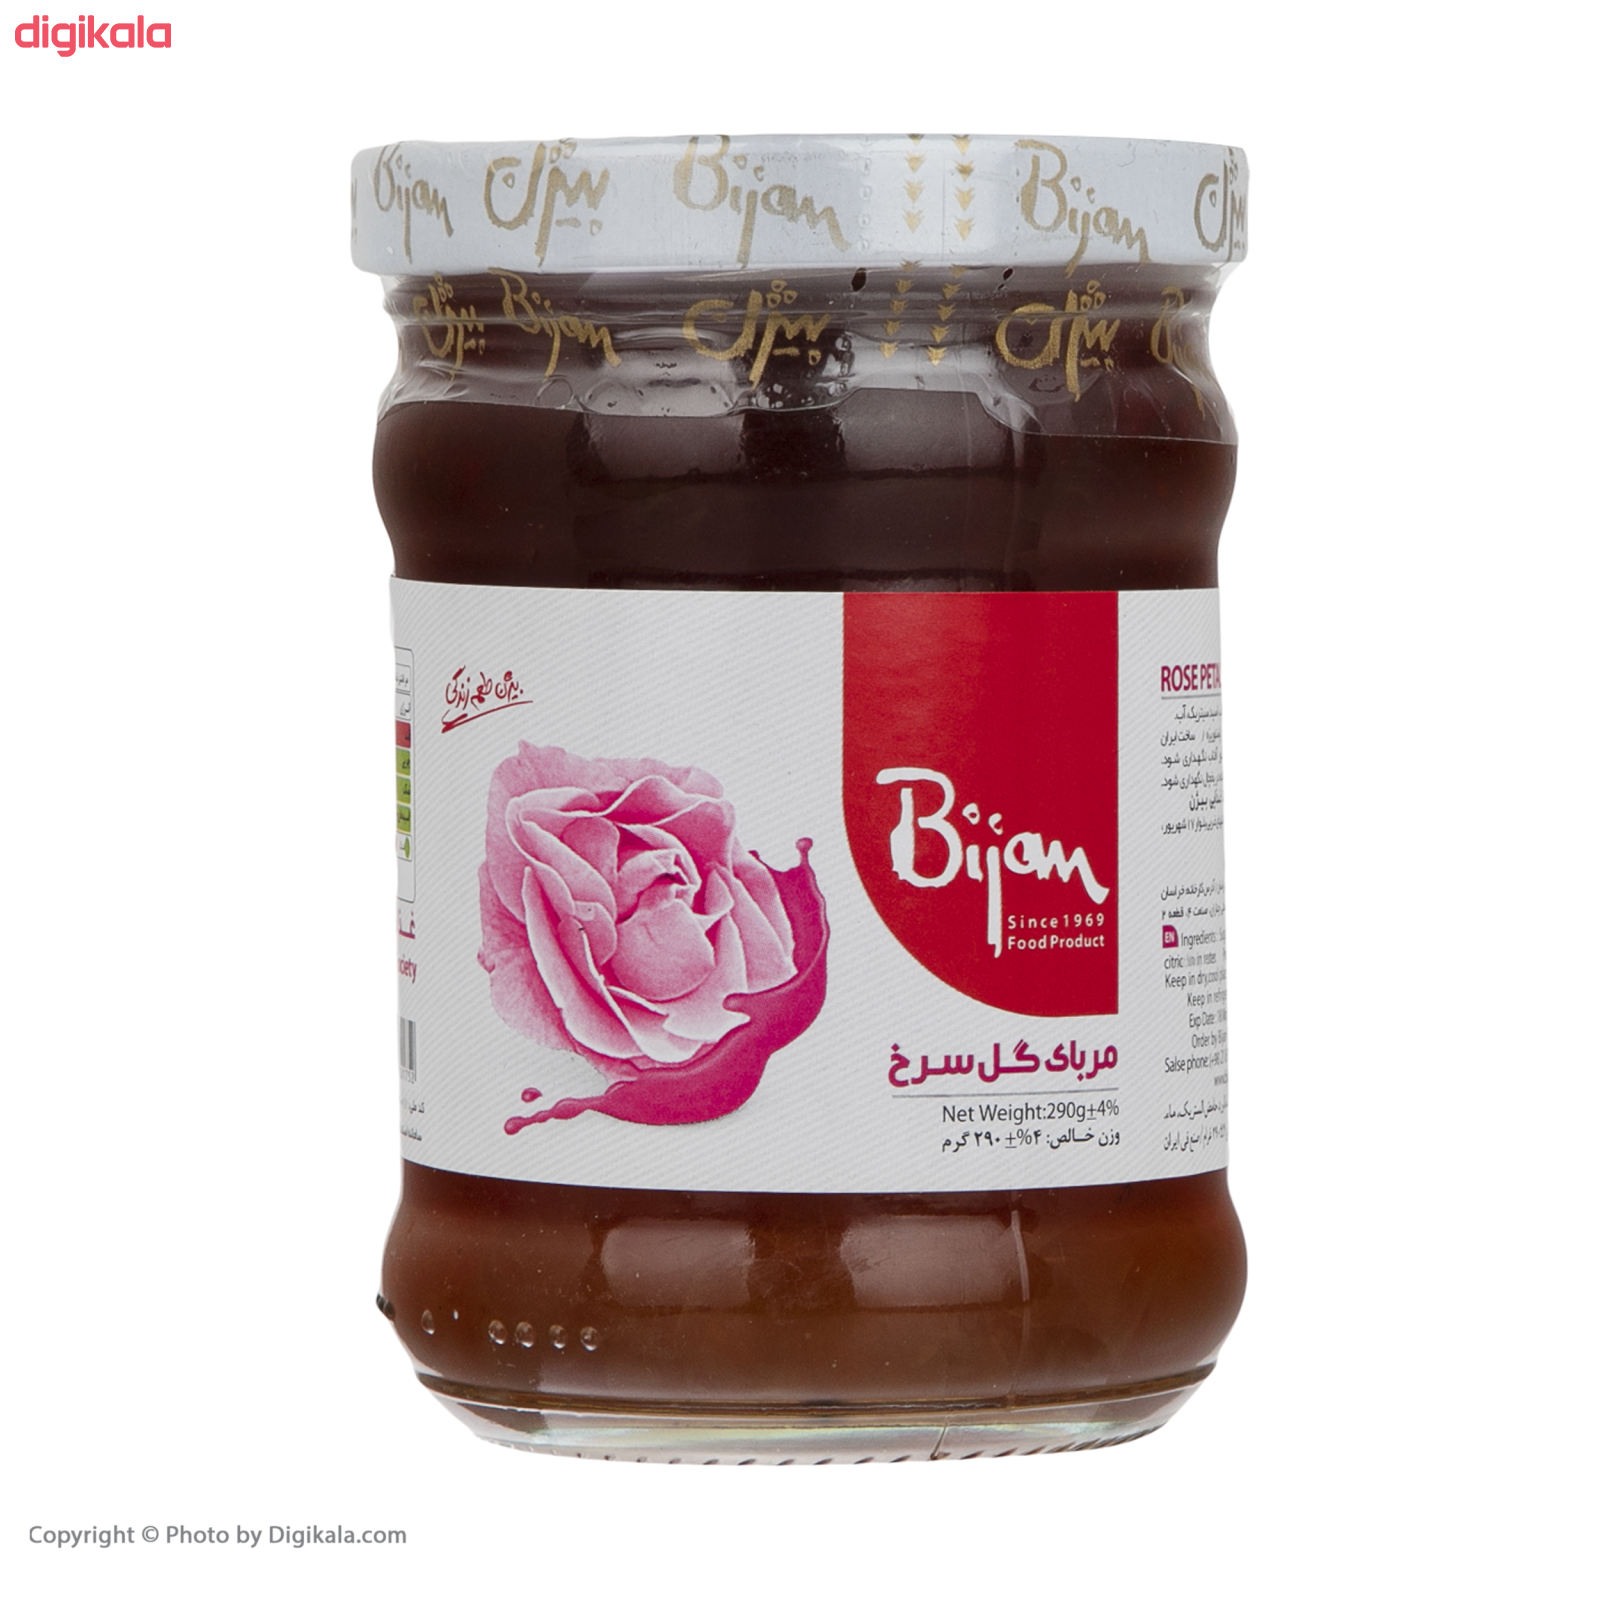 مربا گل سرخ بیژن - 290 گرم   main 1 3